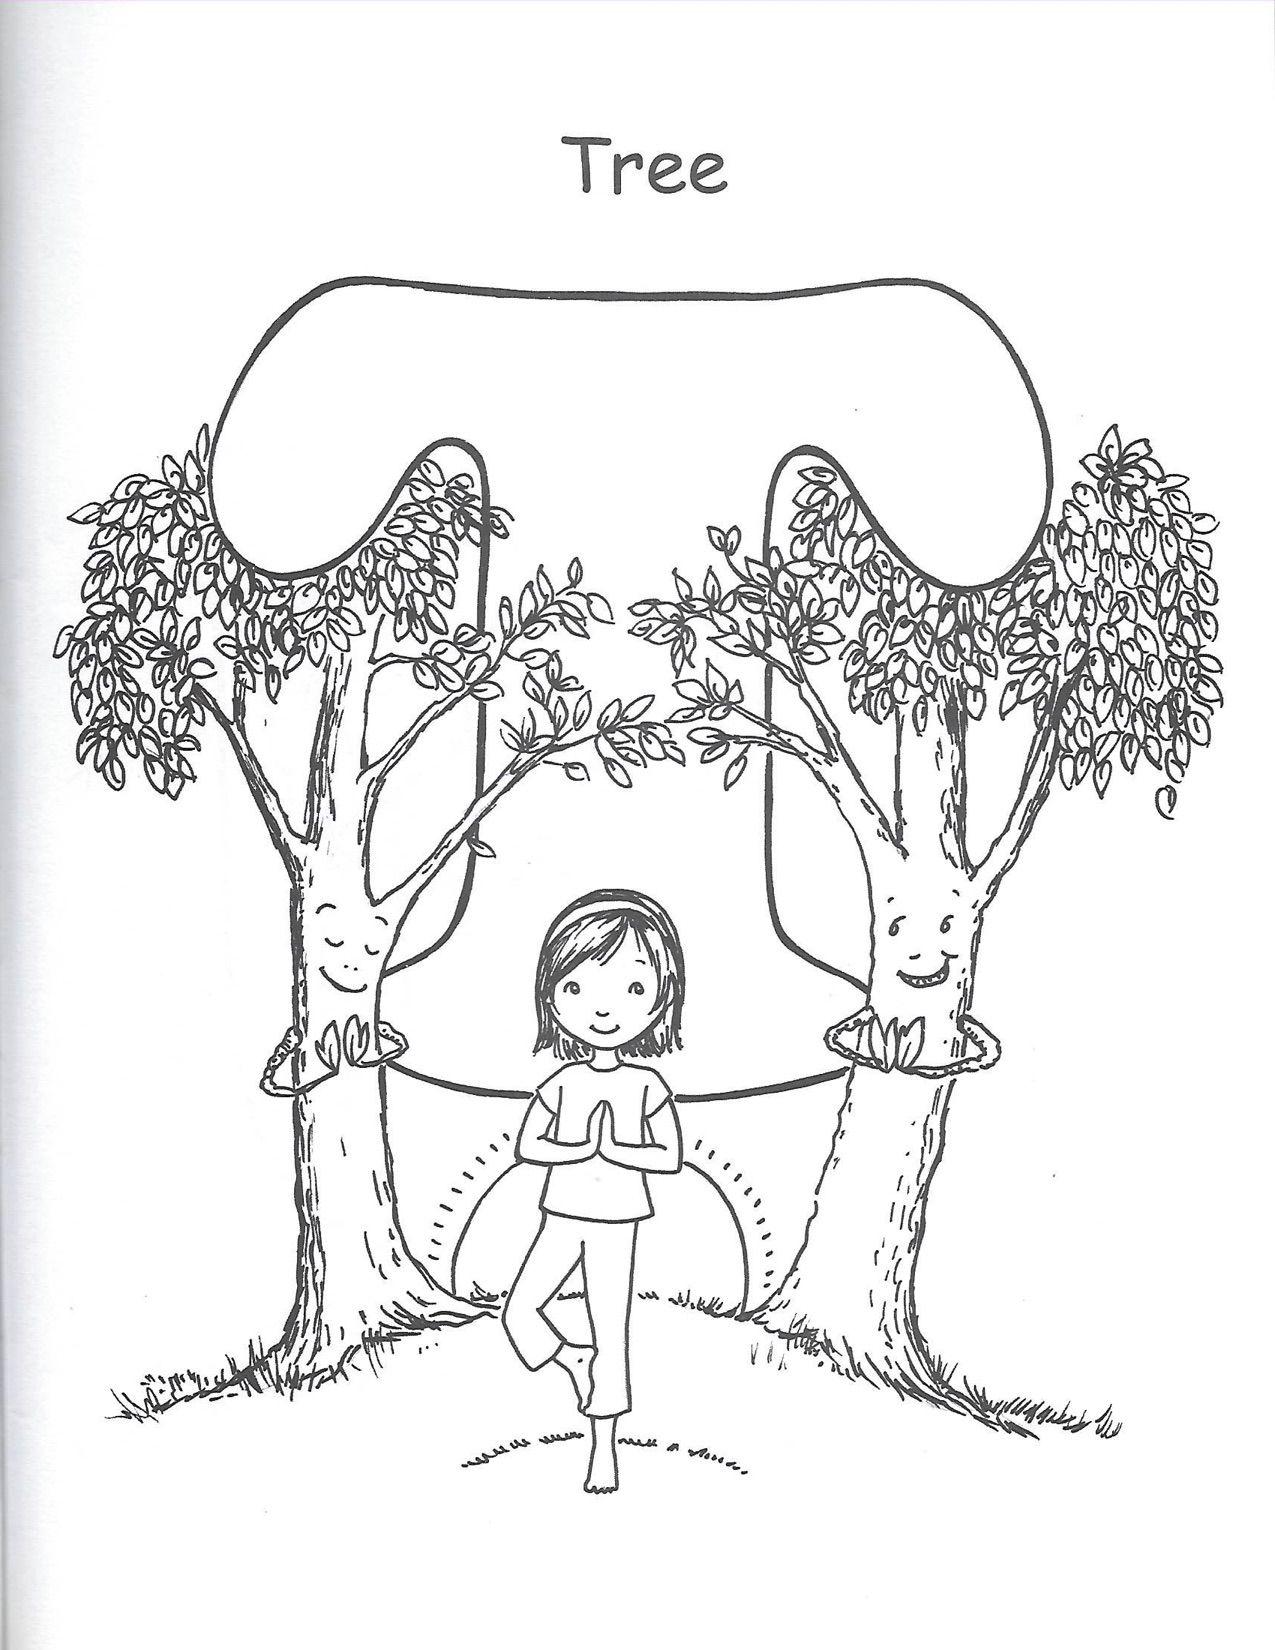 T Tree Yoga For Kids Kids Yoga Poses Printables Free Kids [ 1650 x 1275 Pixel ]